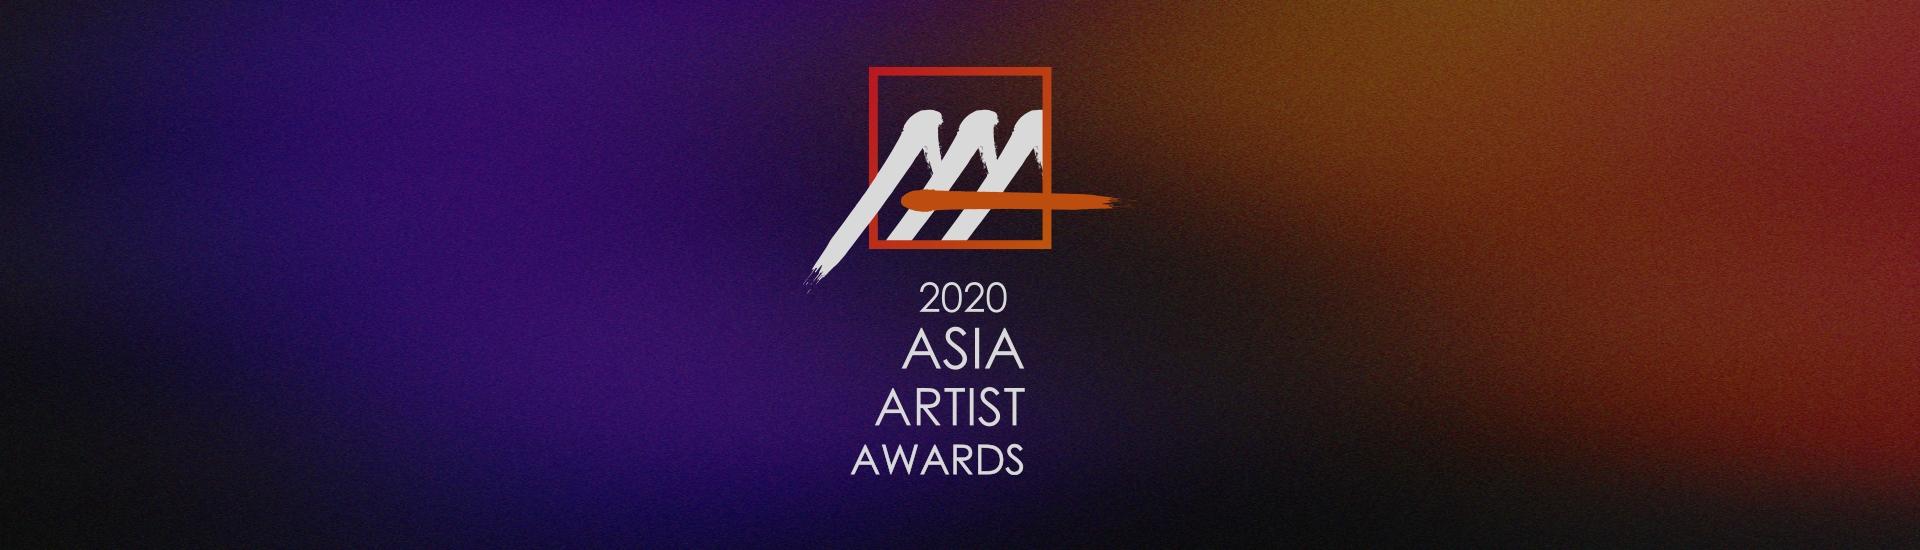 ASIA ARTIST AWARDS - 2020 ASIA ARTIST AWARDS